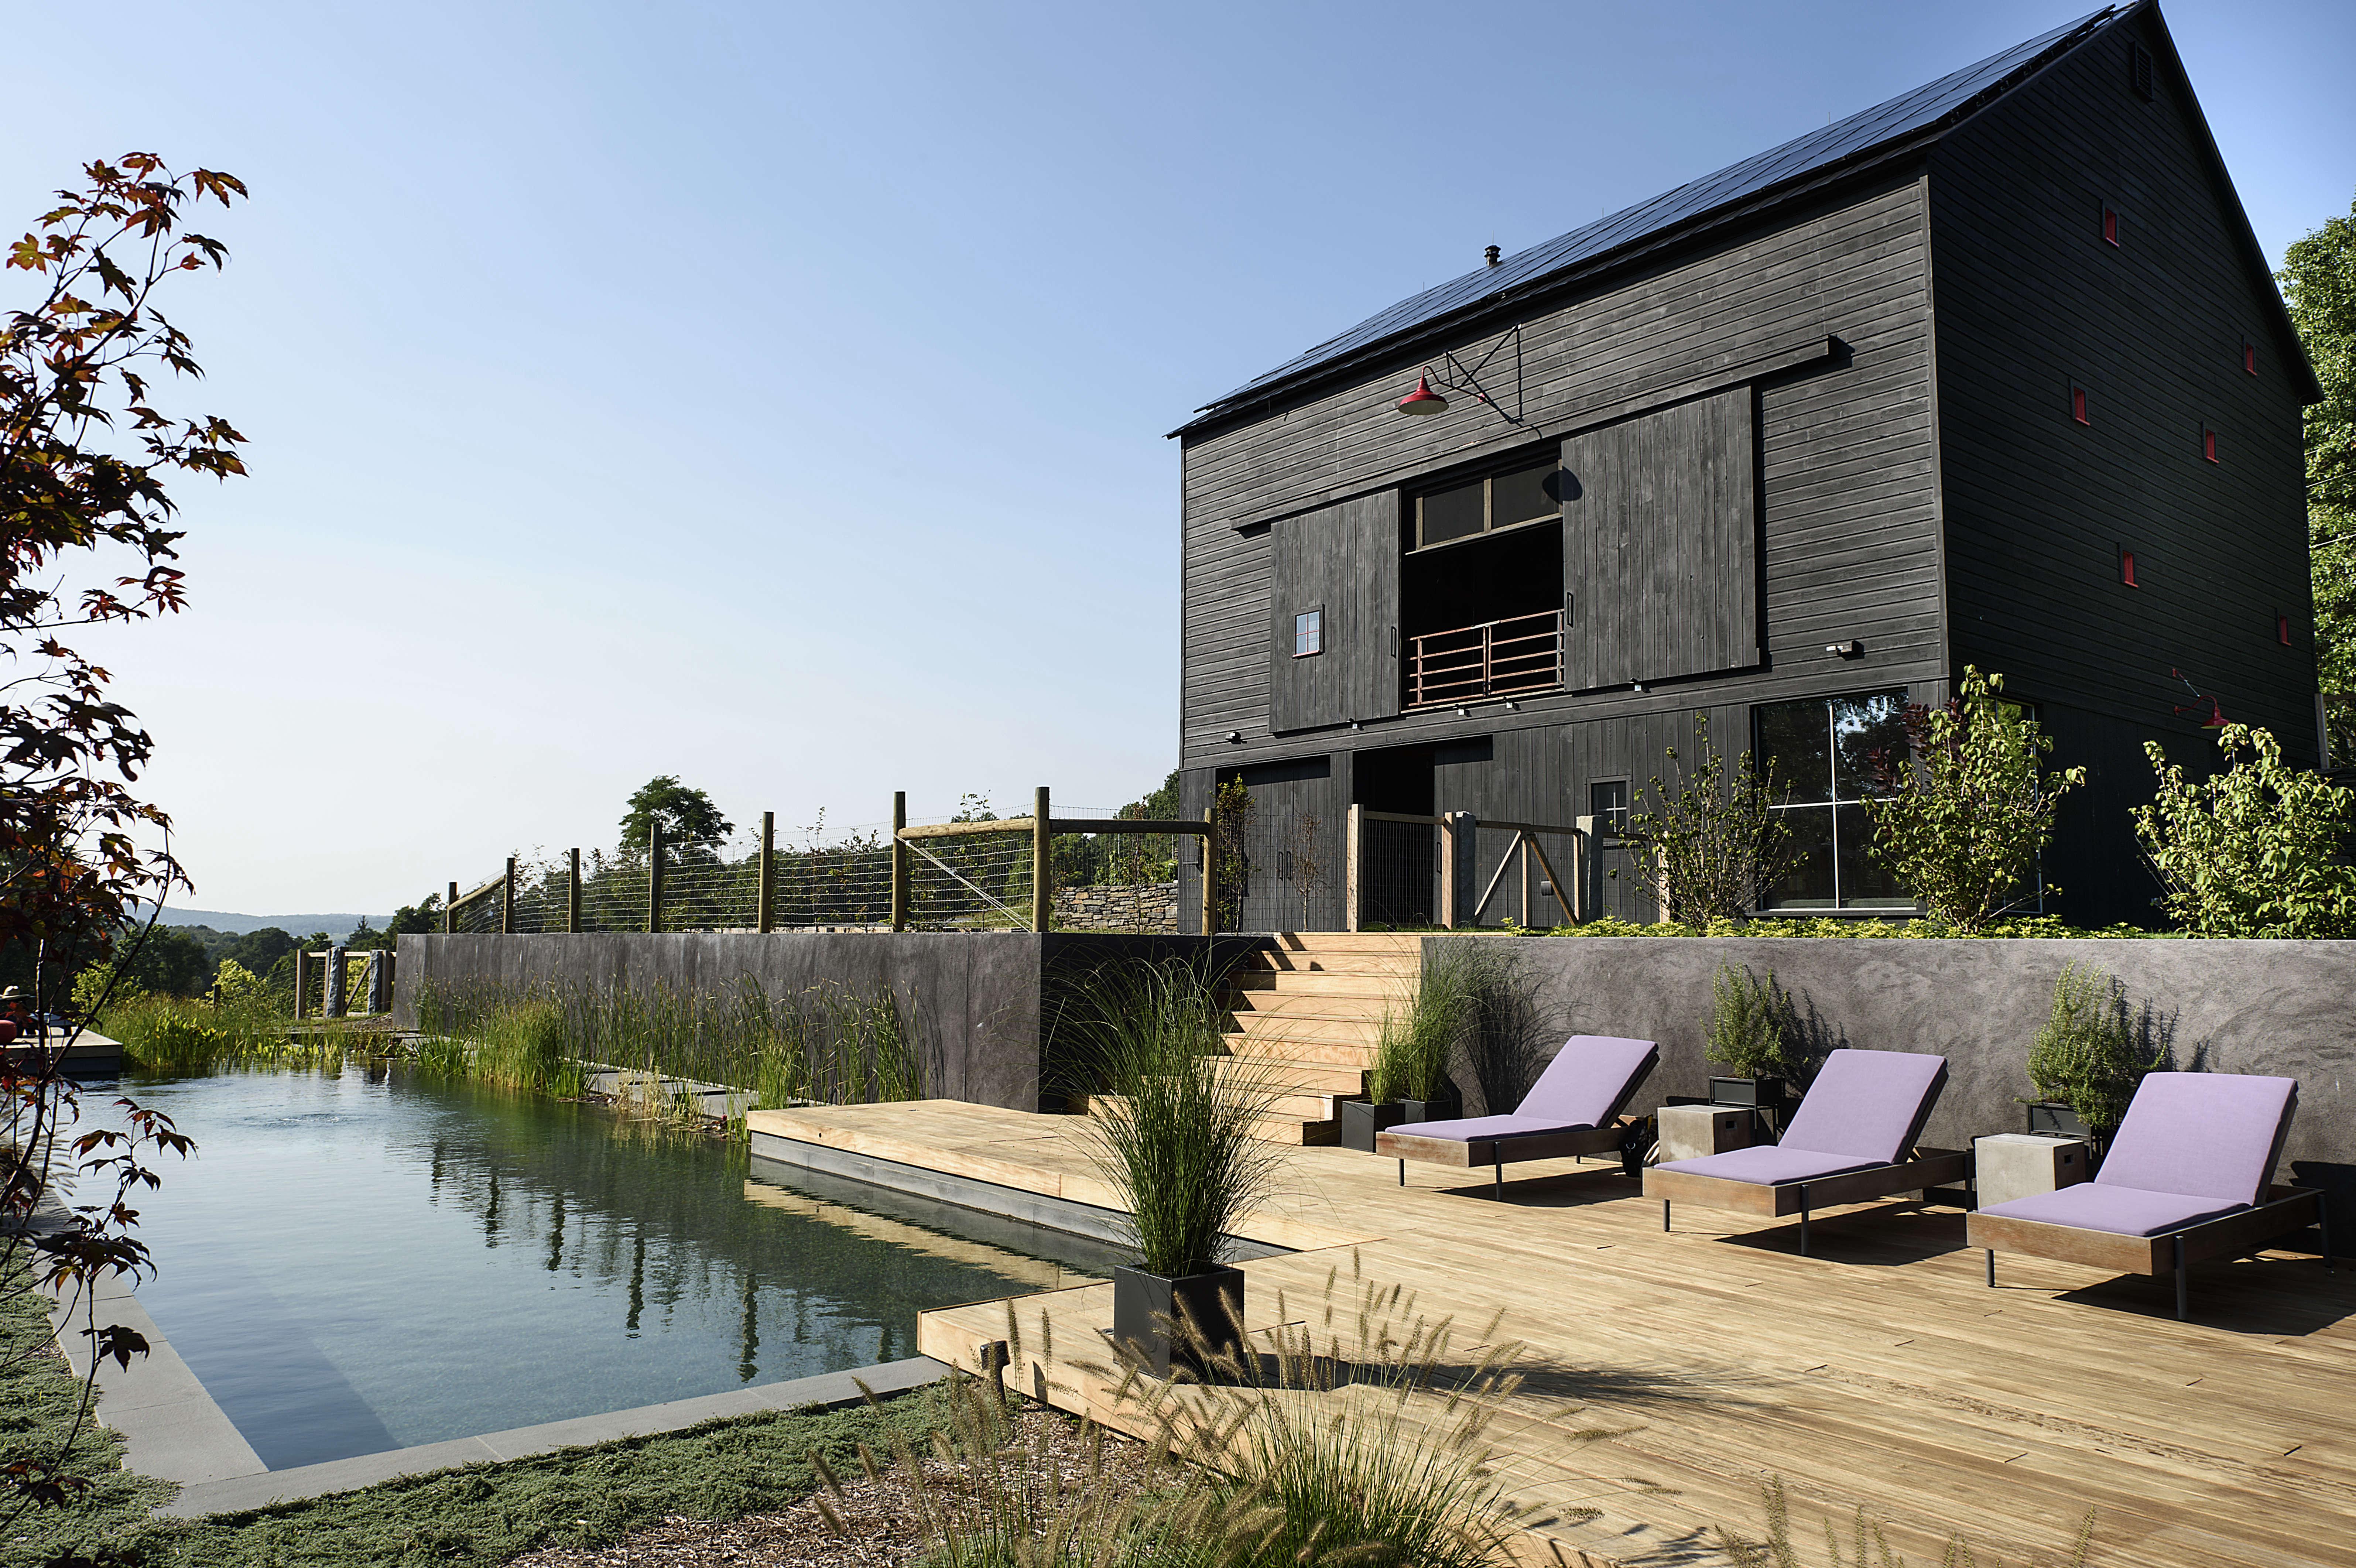 Barliswedlick Barn Swimming Pool Loungers